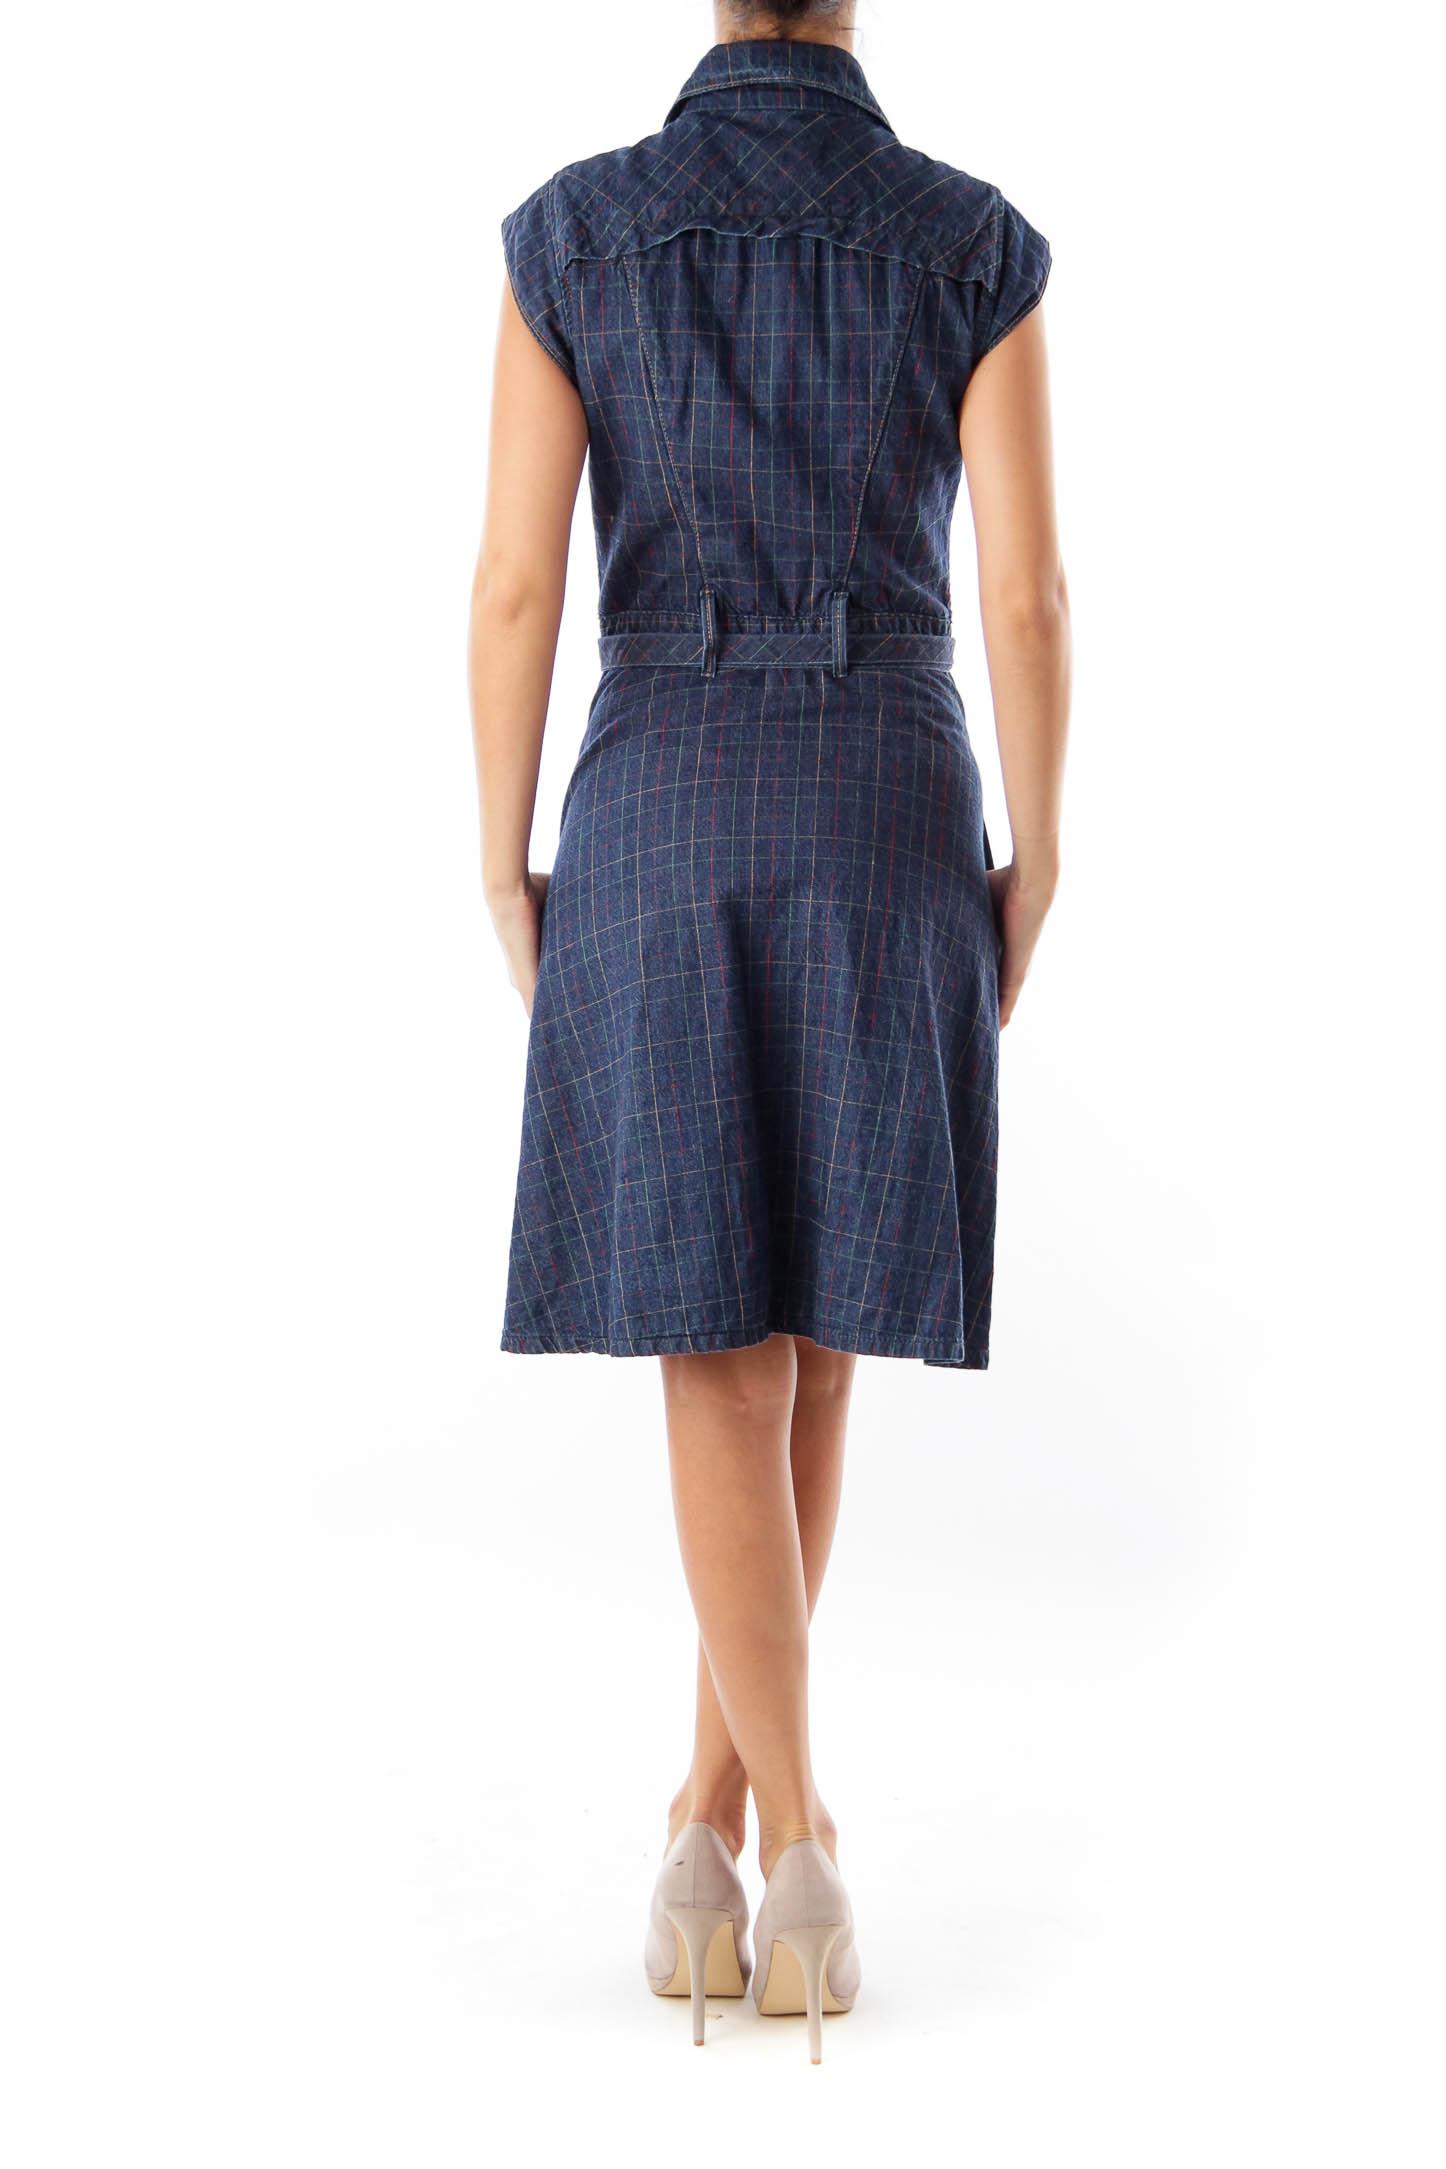 Blue Denim A Line Dress